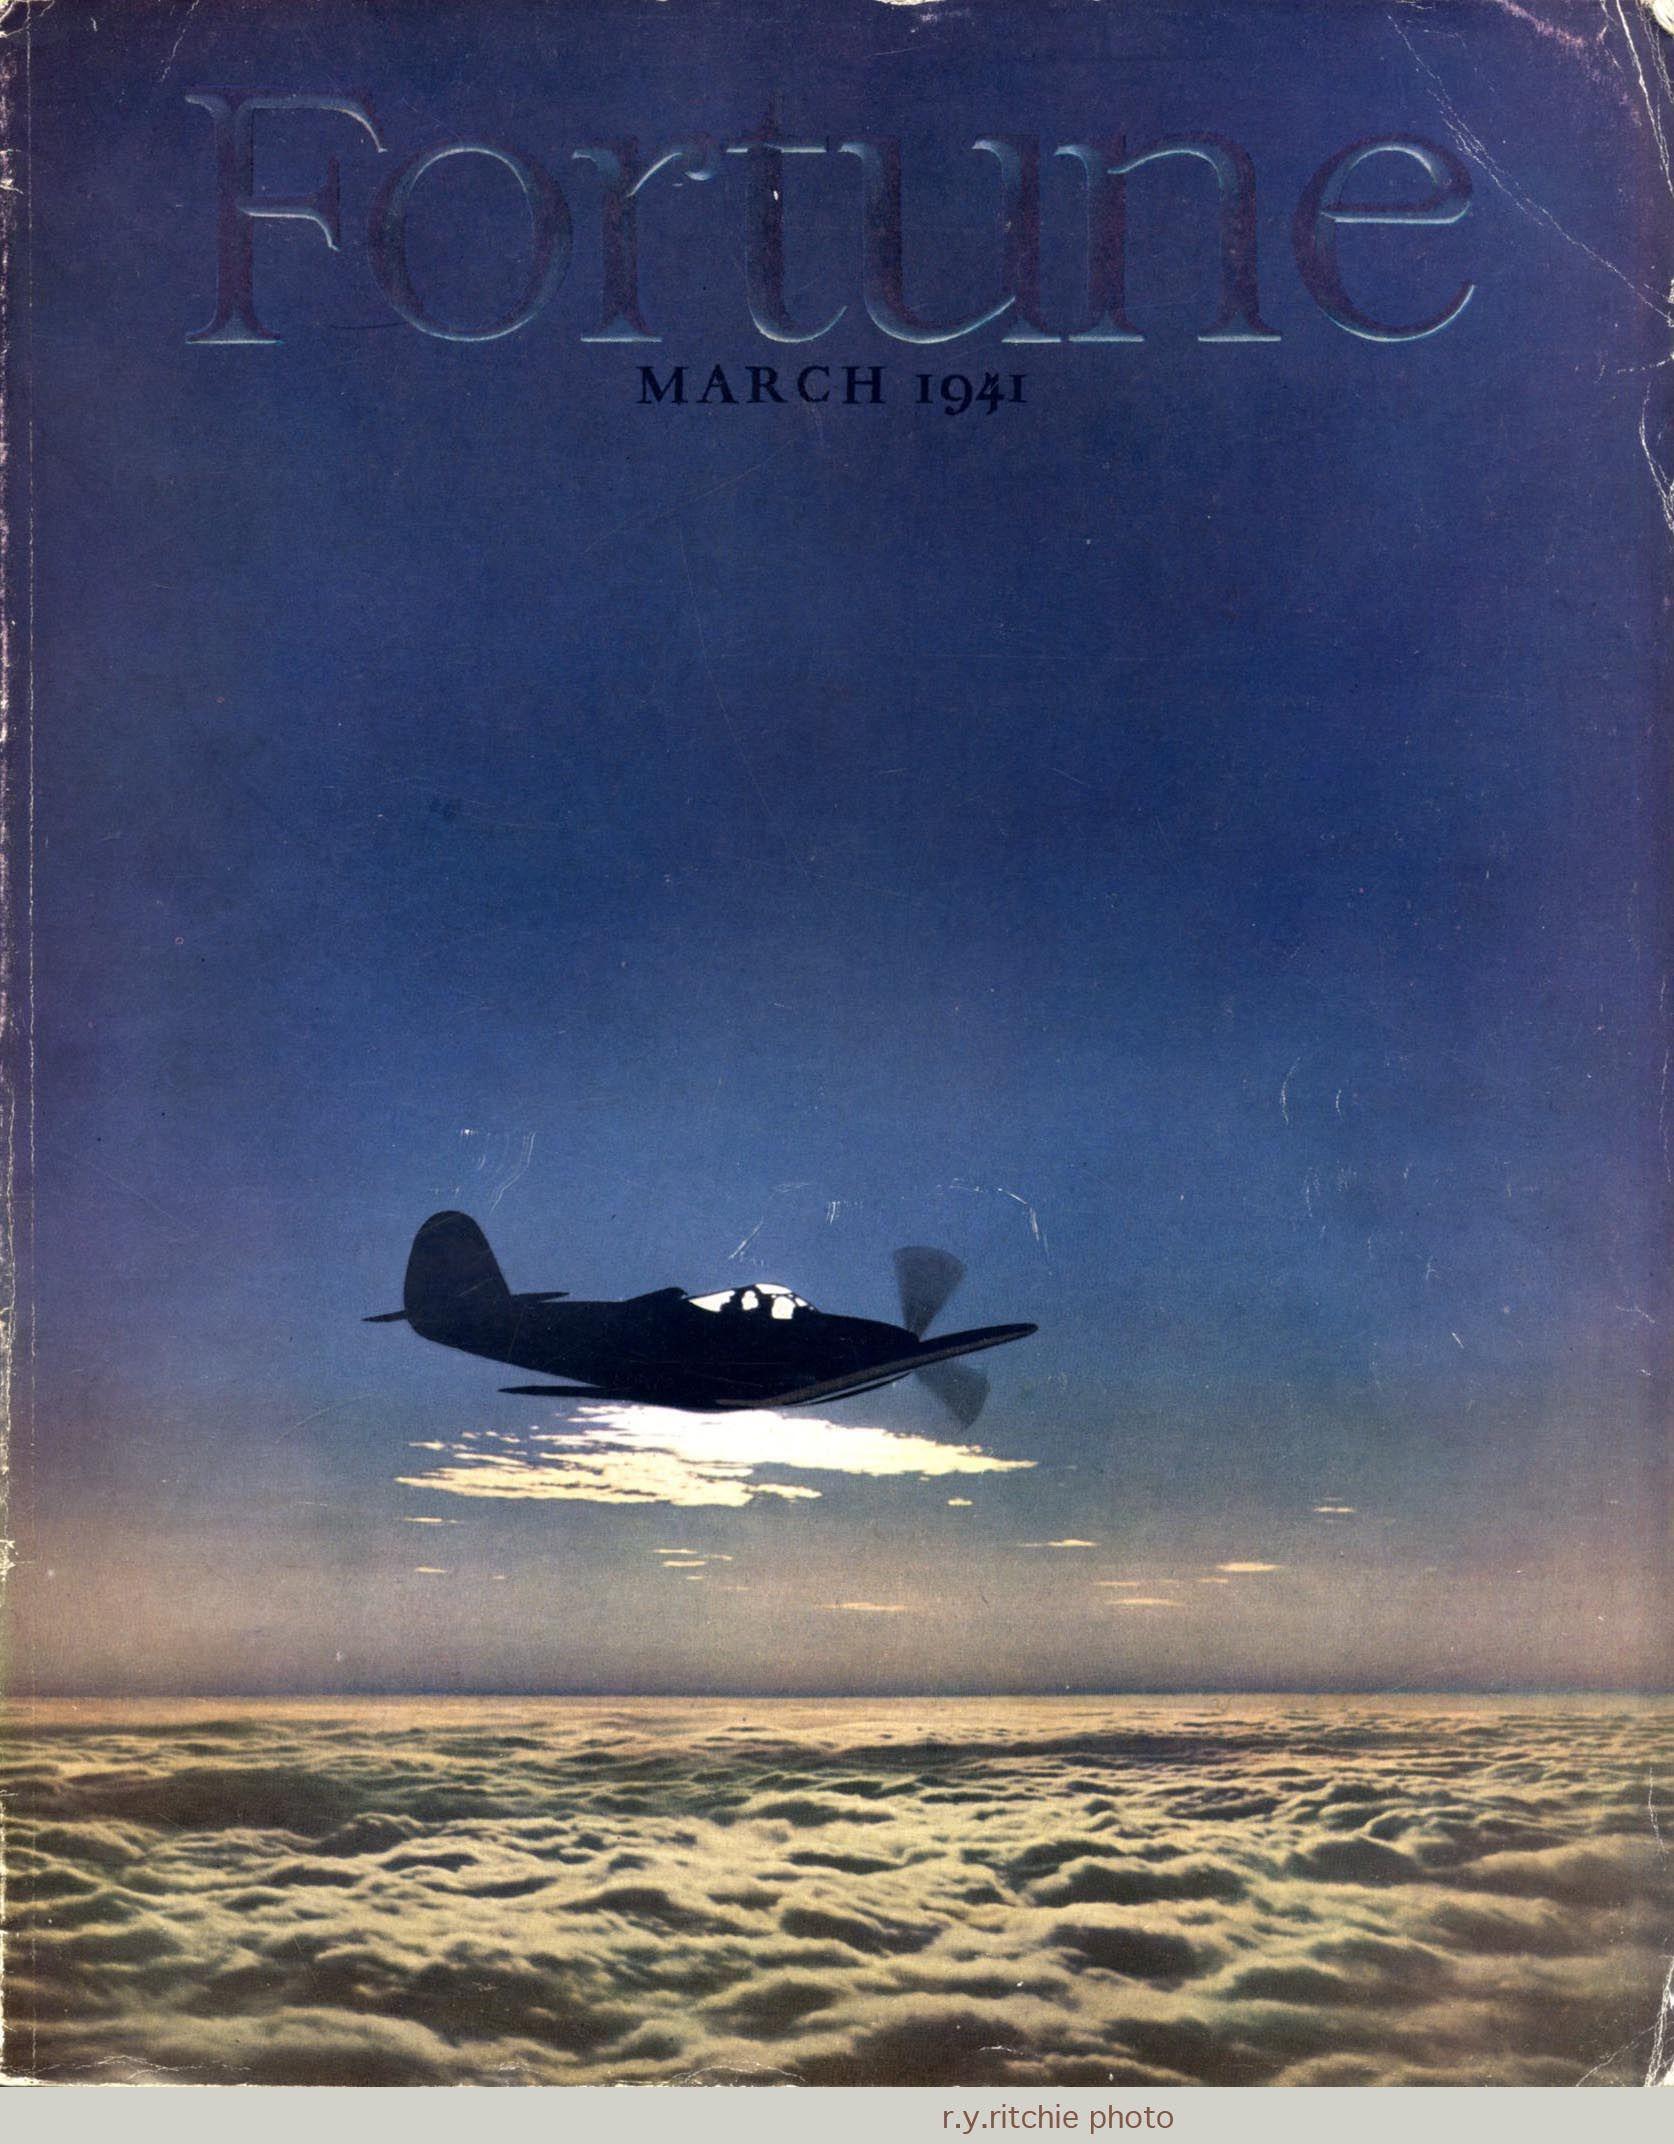 Fortune - March, 1941 | OldBrochures.com